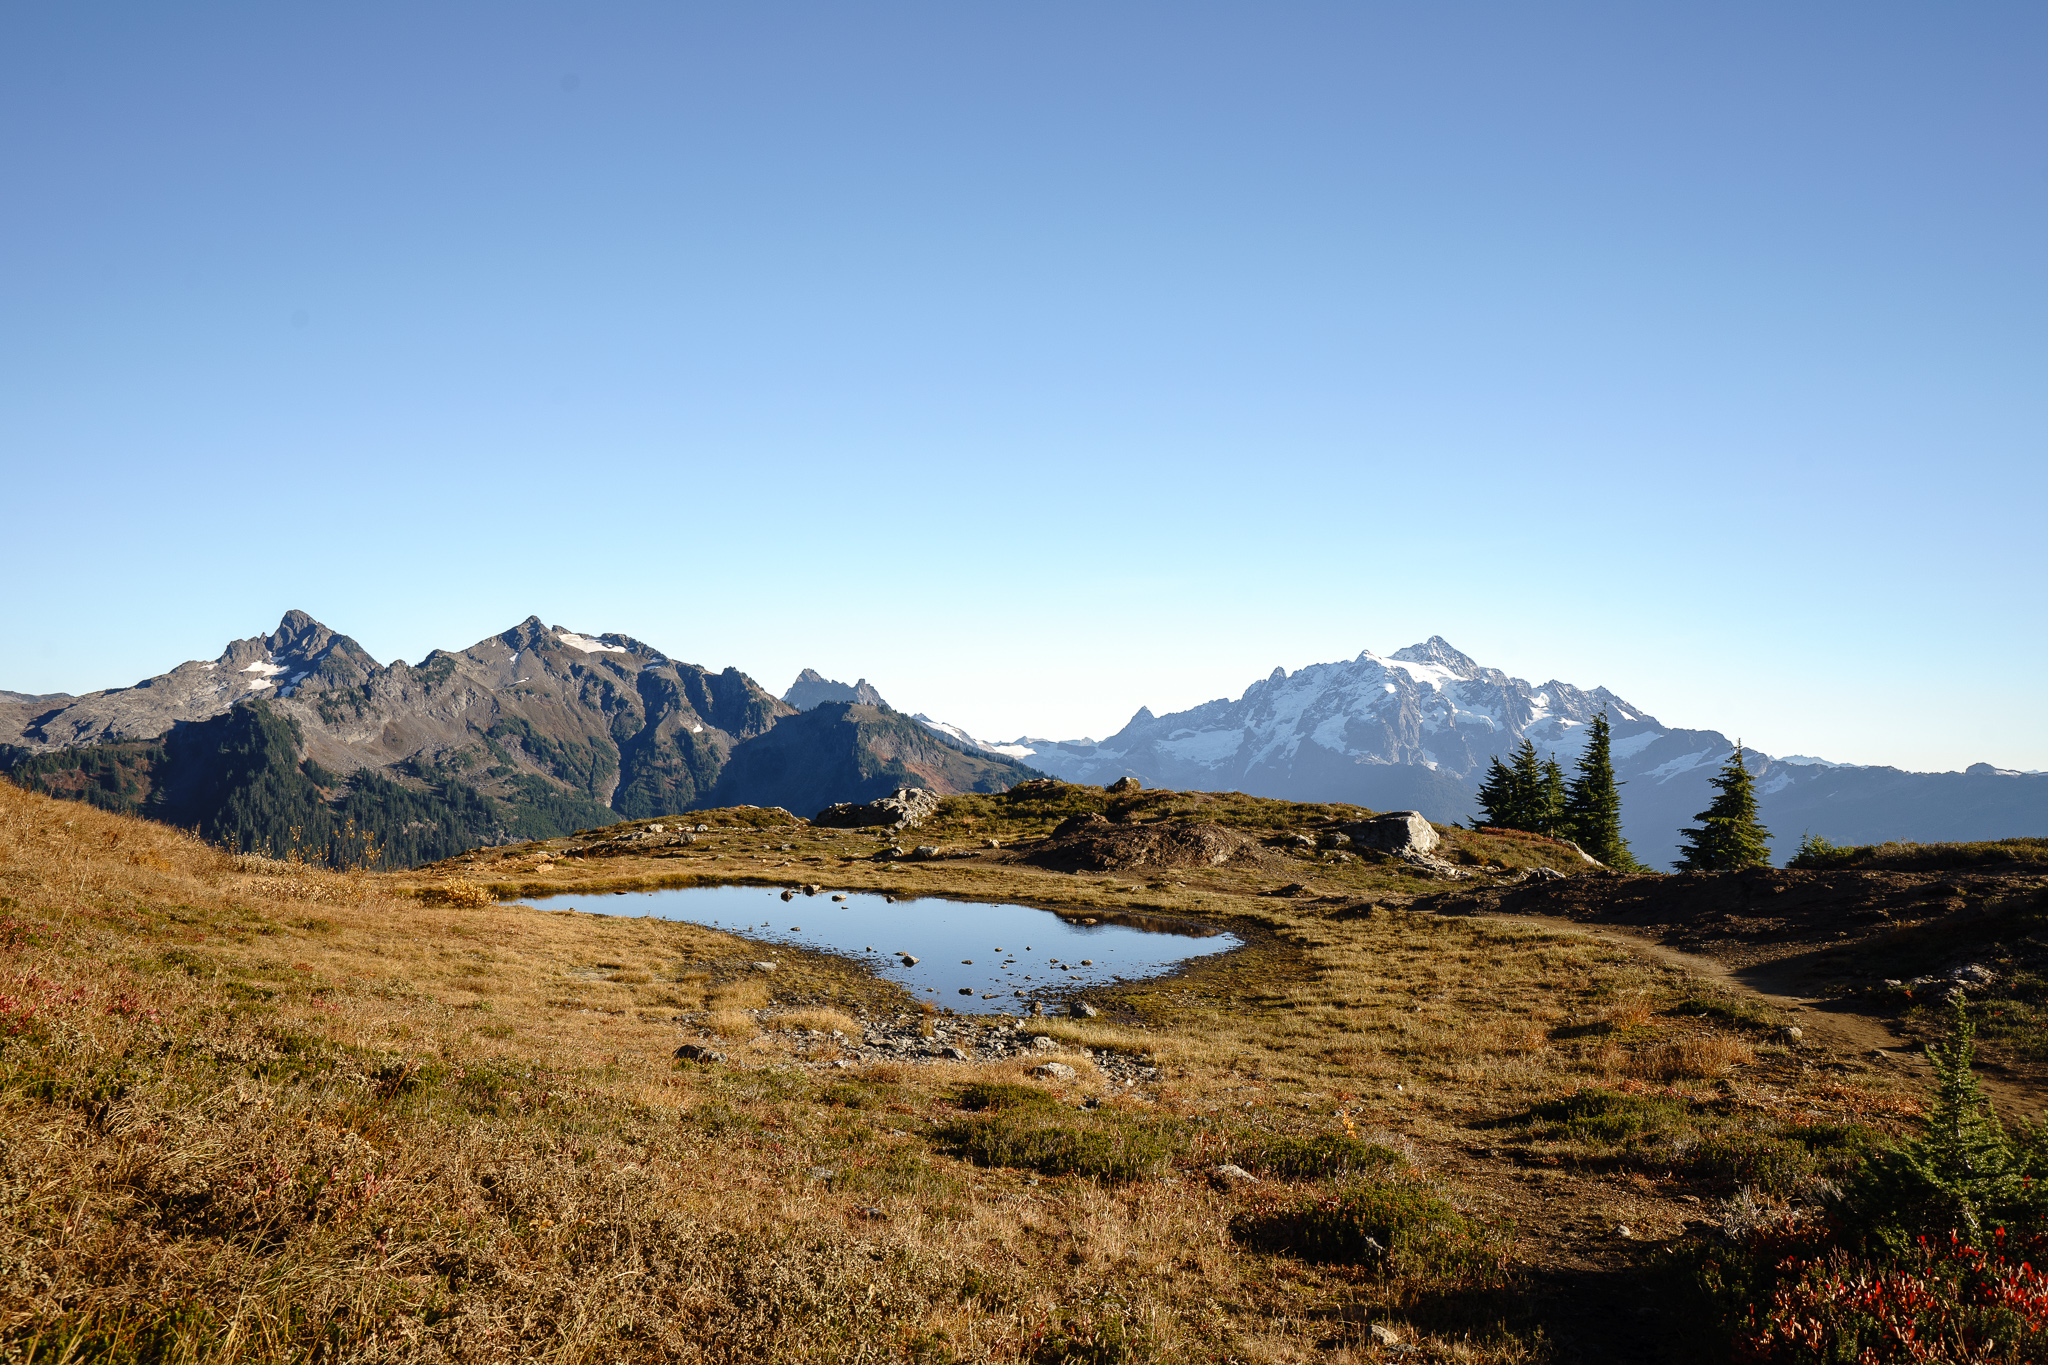 The magical Mt. Shuksan and a pretty little tarn